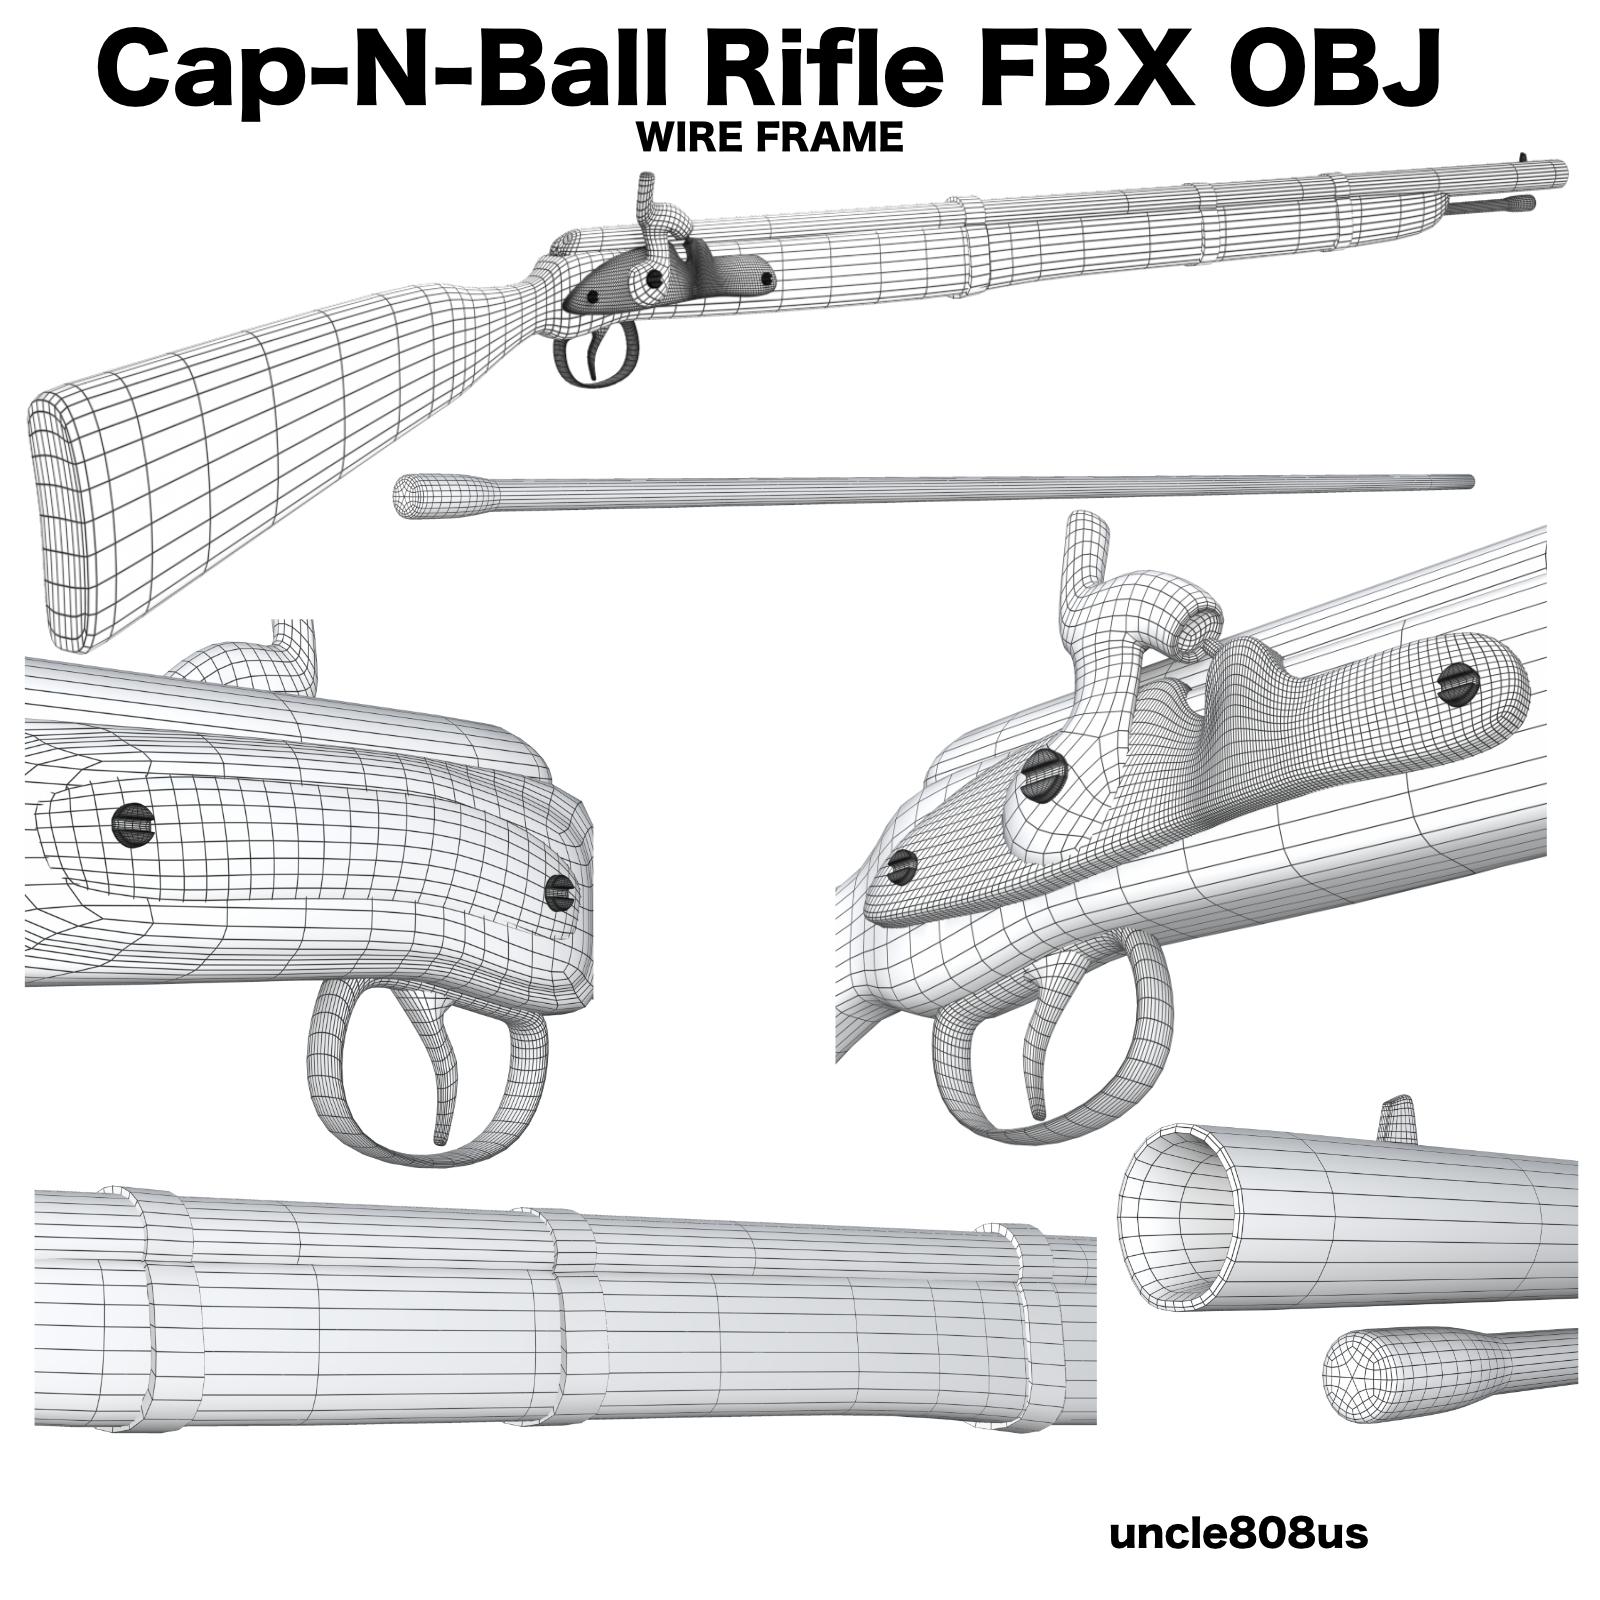 cap-n-ball rifle fbx obj 3d model fbx 220982